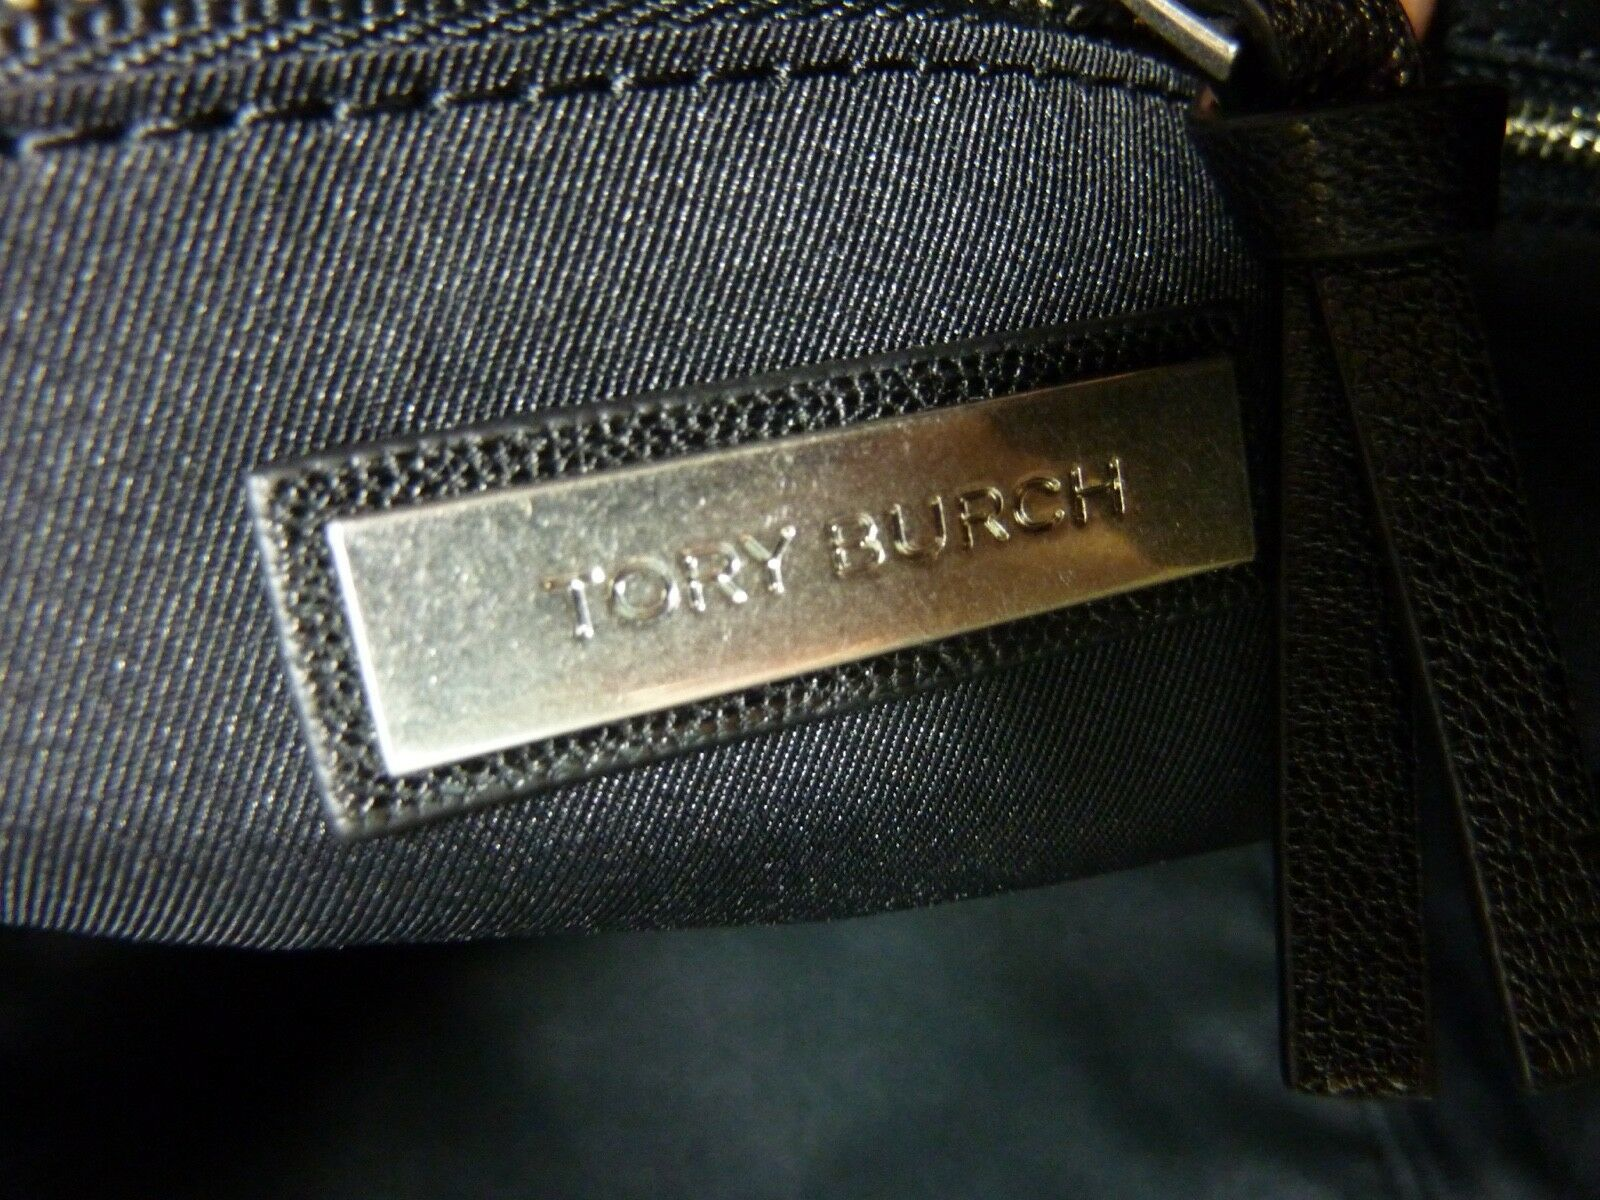 Nwt Tory Burch Schwarz Antikleder Fleming Tote image 12